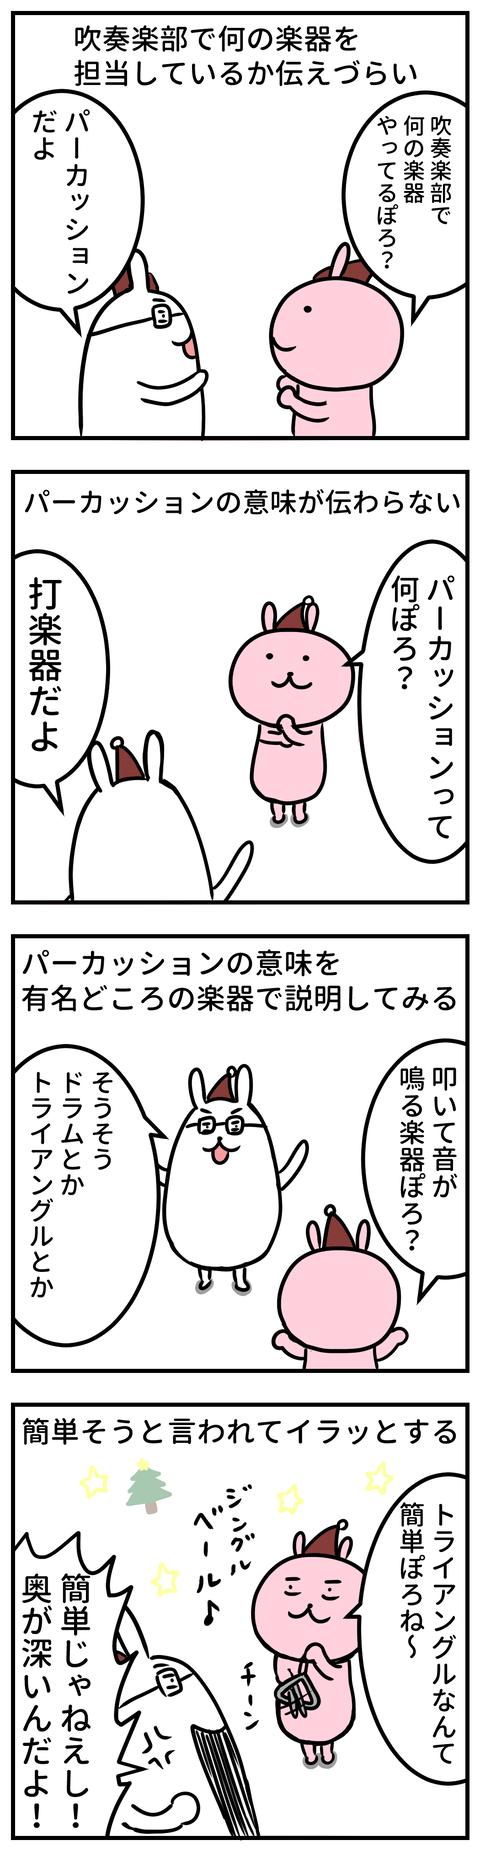 manga-yuzuporo59-1